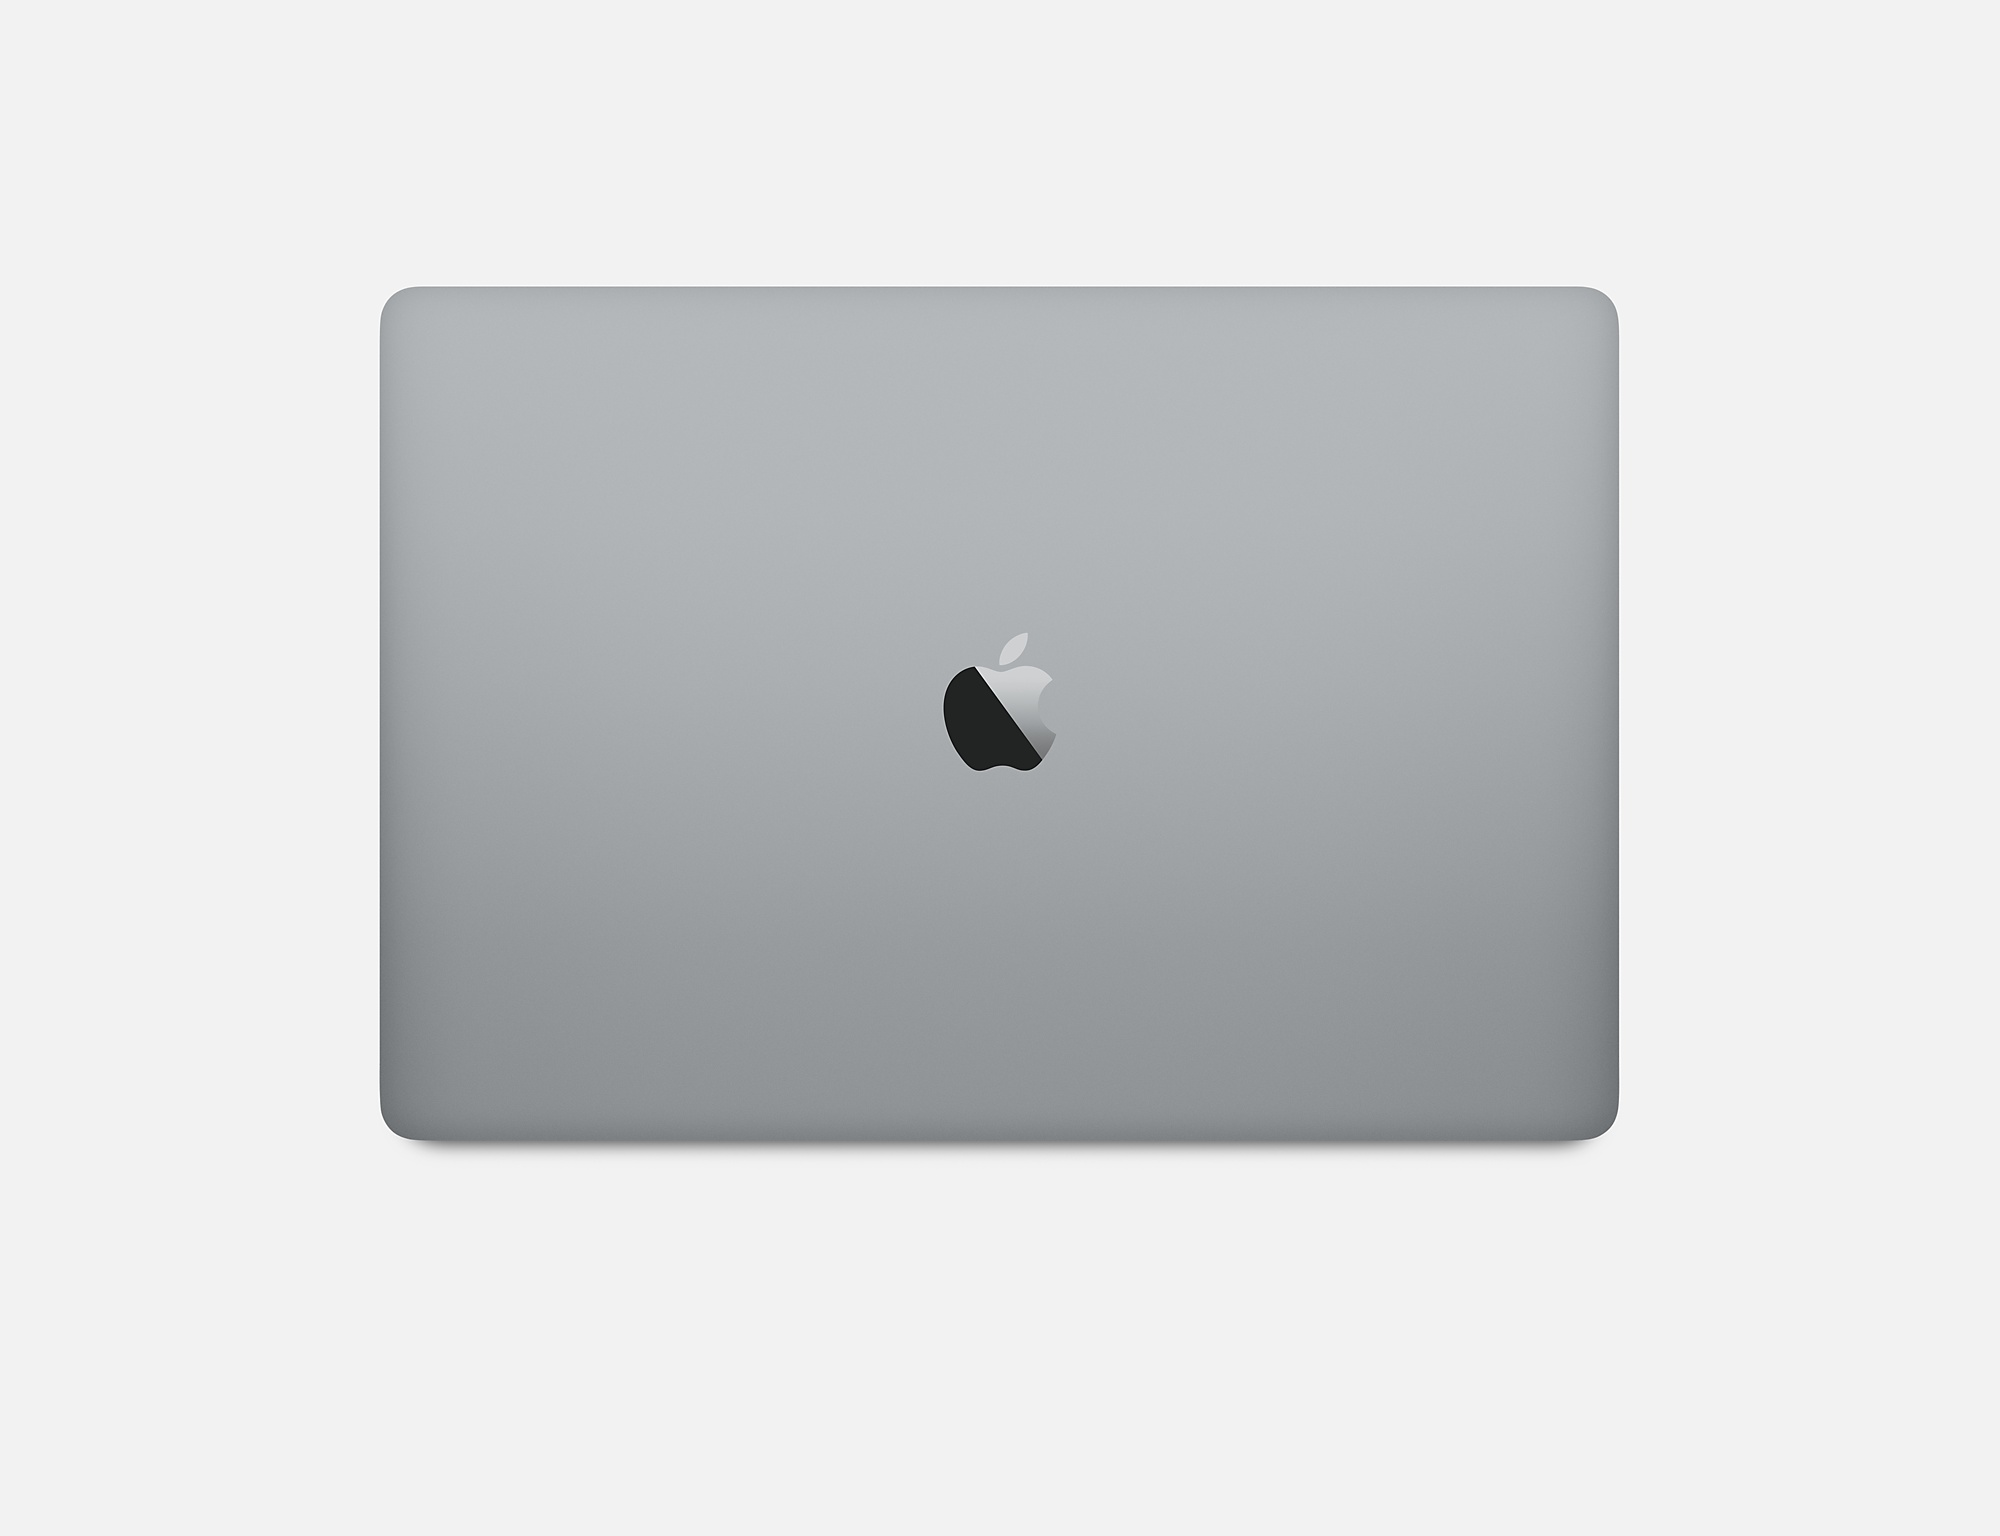 Apple Macbook Pro 15 Quot 2 90 Ghz Core I7 New Calgary